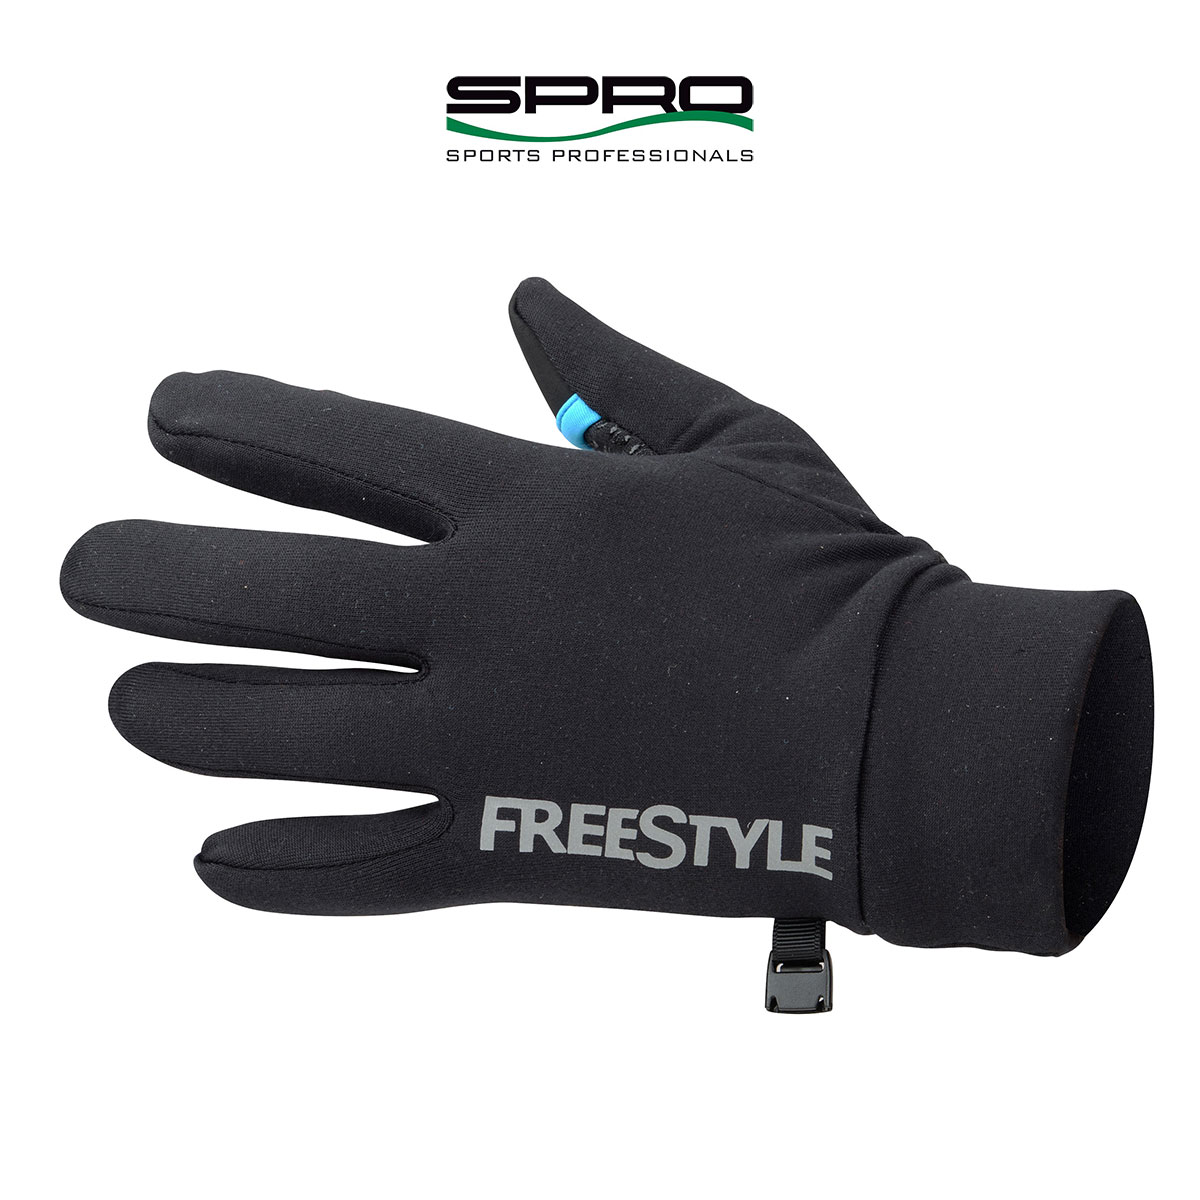 Spro Freestyle Skin Gloves